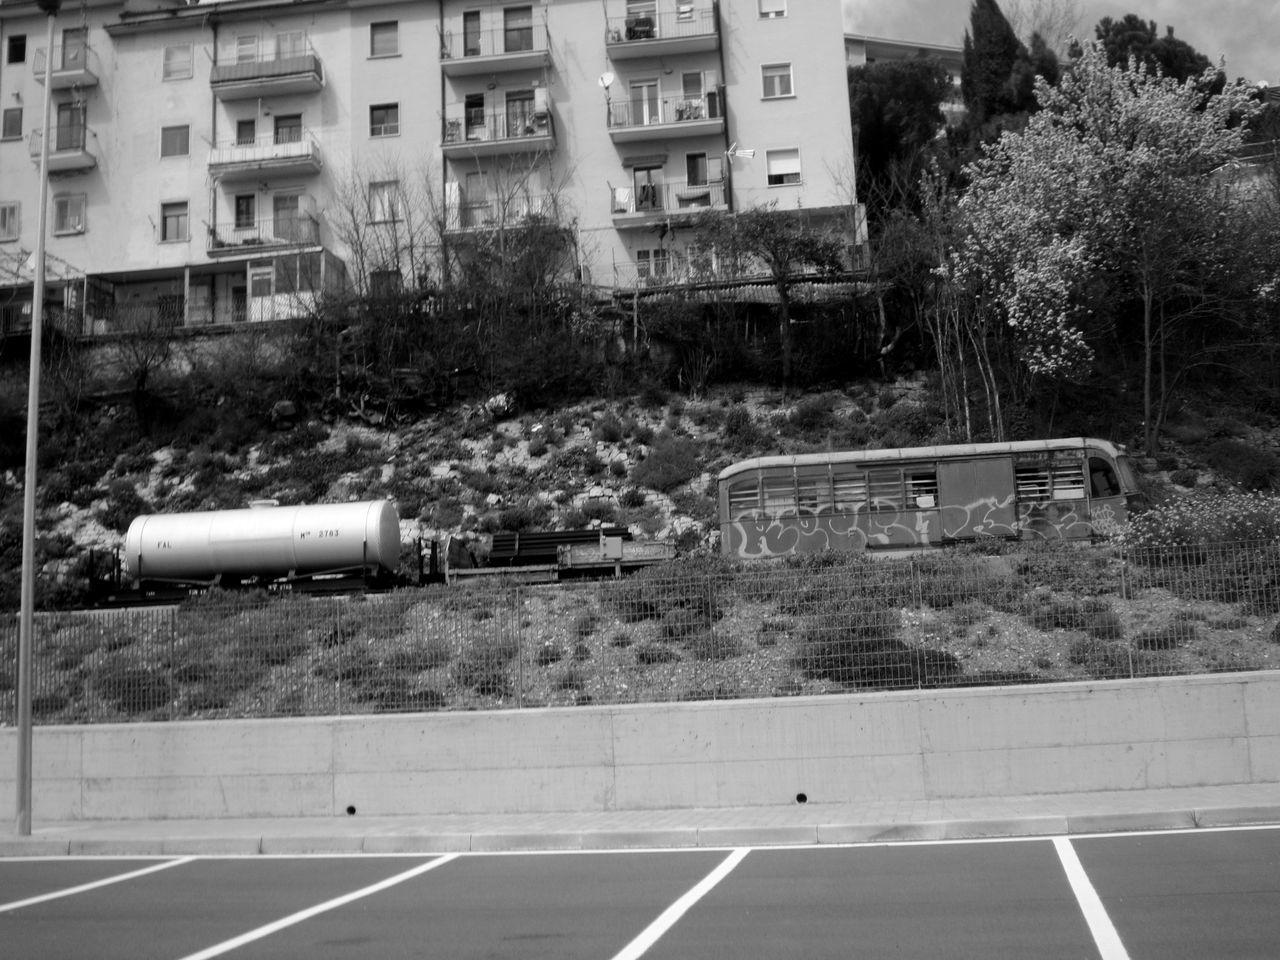 #lucania #basilicata #bianconero #Black&White #blackandwhite #fotobiancoenero #fotobianconero #Italia #italy #OldPicture #potenza #potenzainferiore #urban #urbanphotography